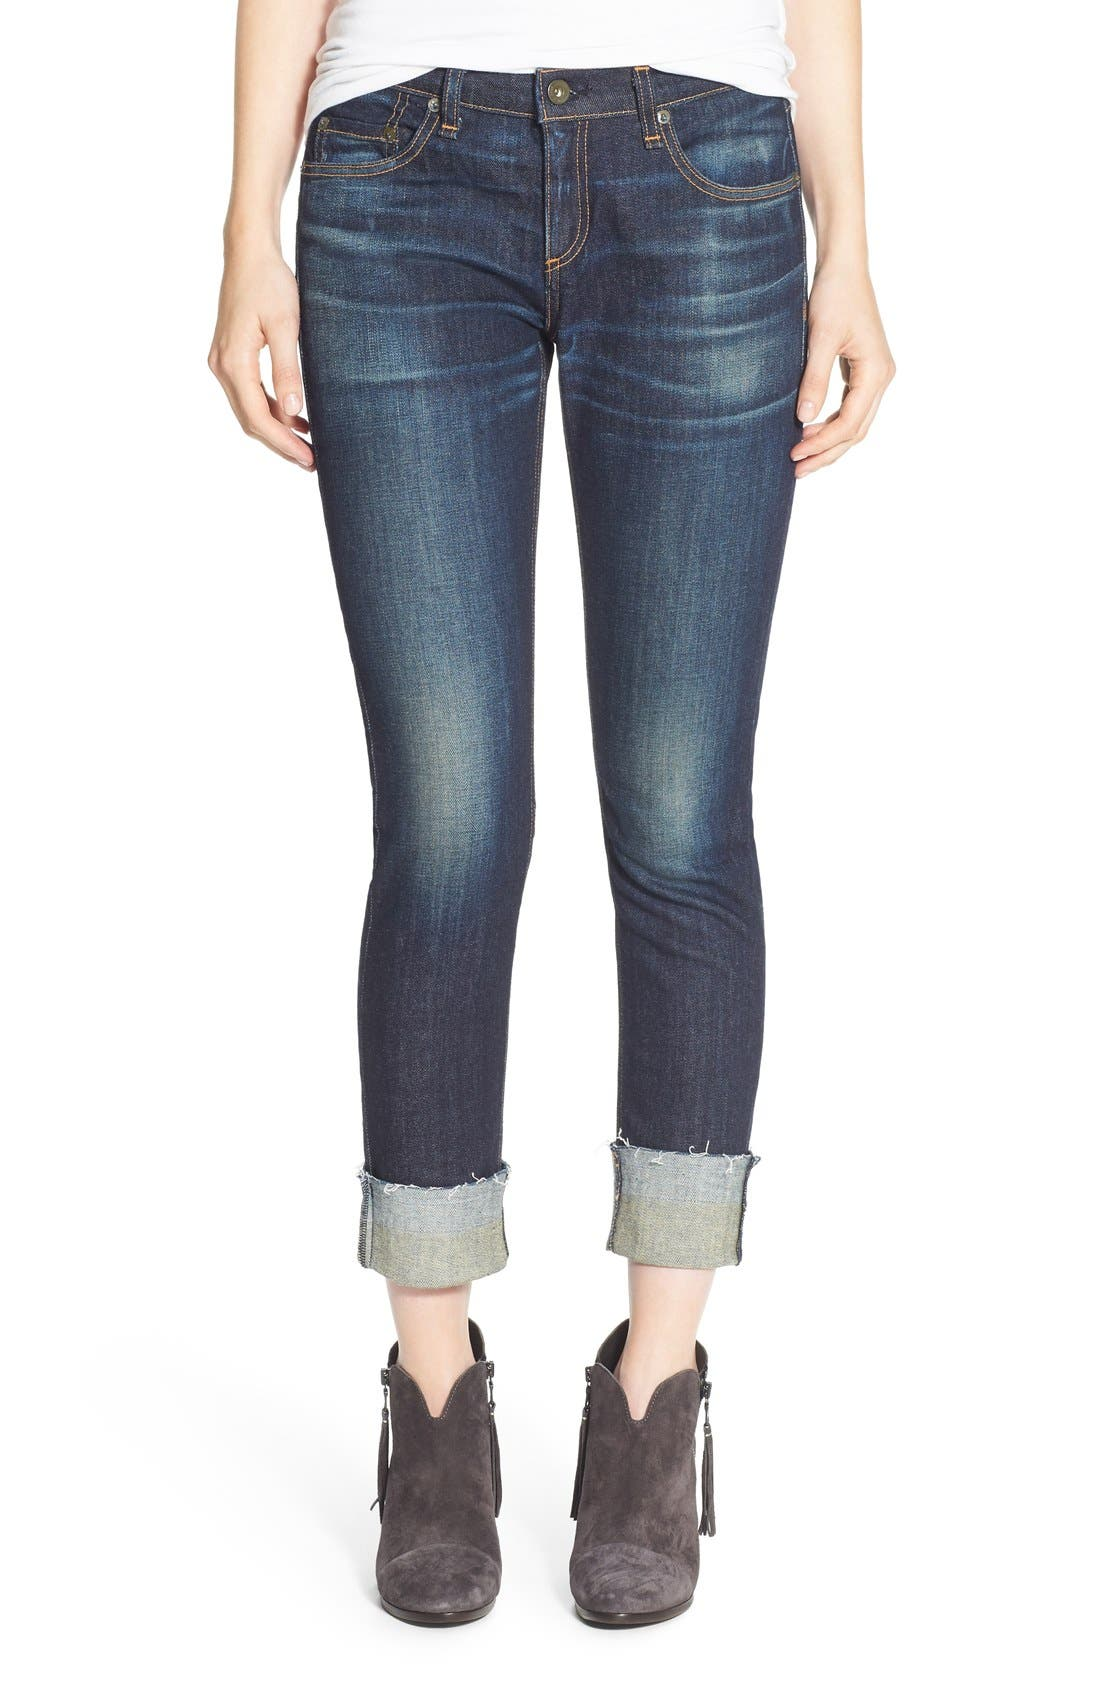 Main Image - rag & bone/JEAN 'The Dre' Slim Fit Boyfriend Jeans (Yesler)